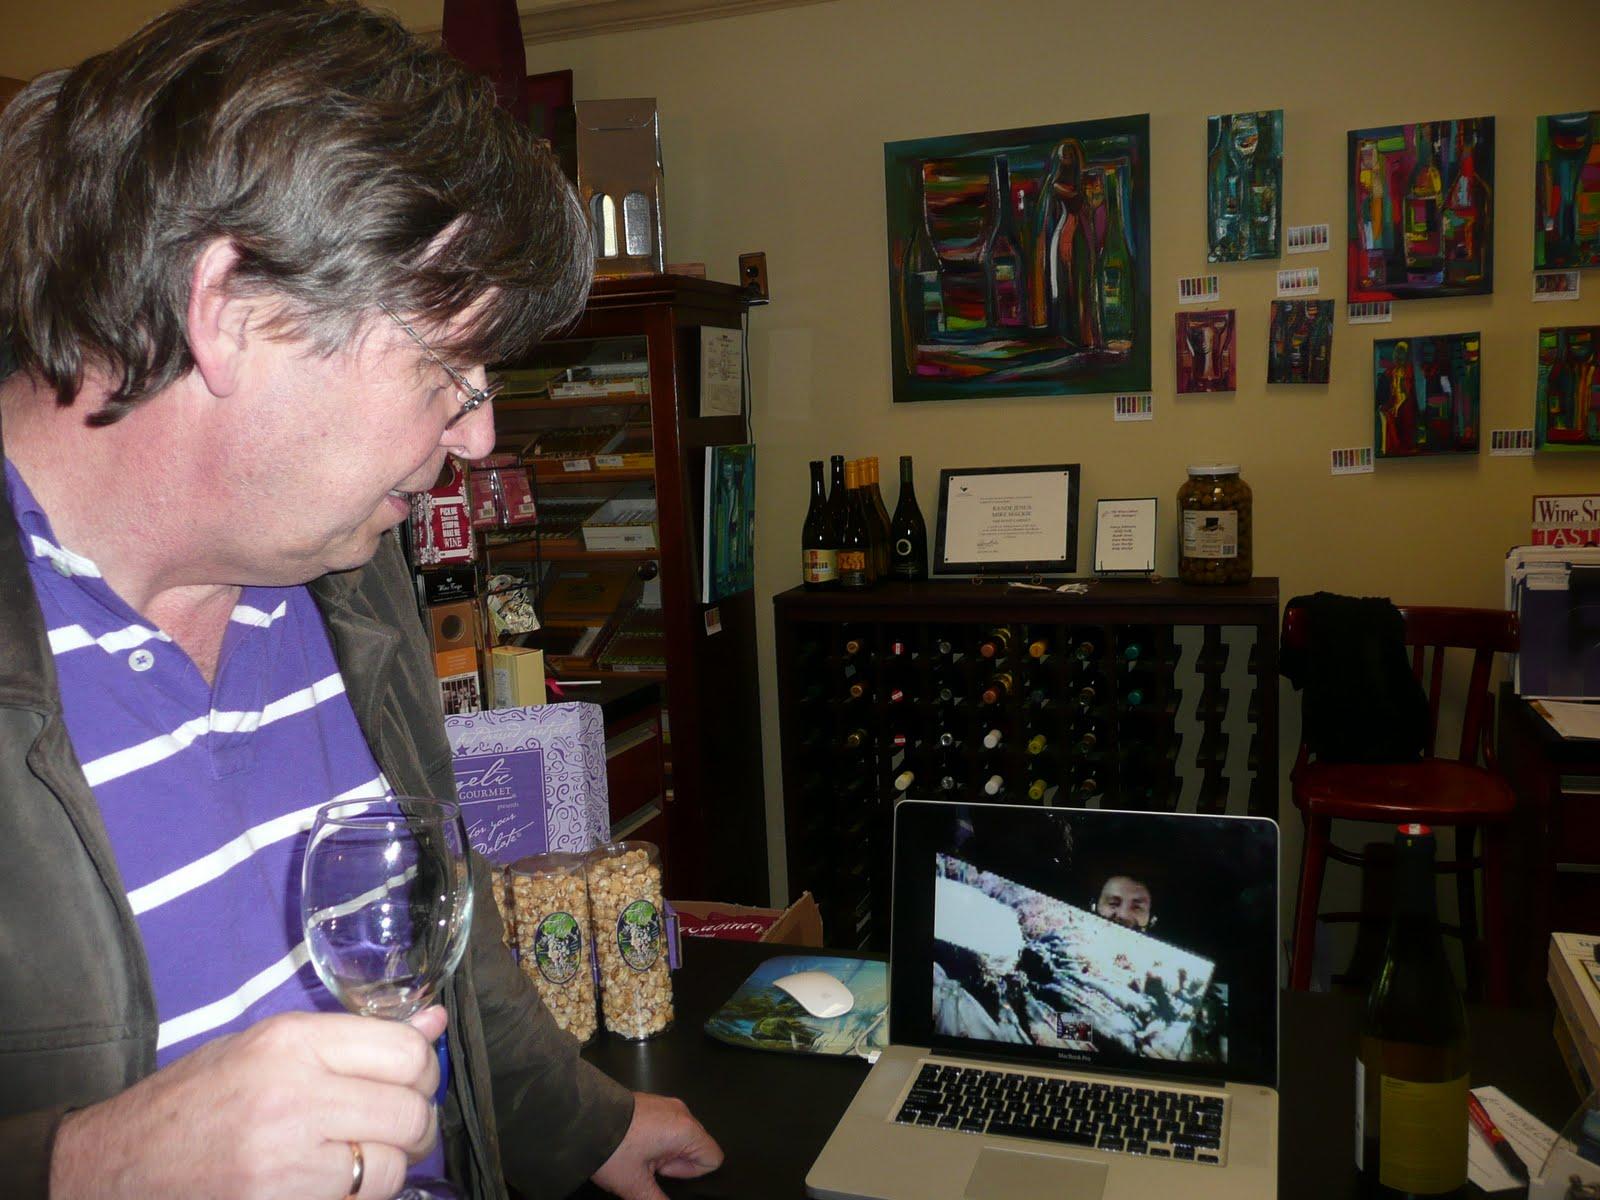 schillerwine Skype and Biodynamic Winemaking